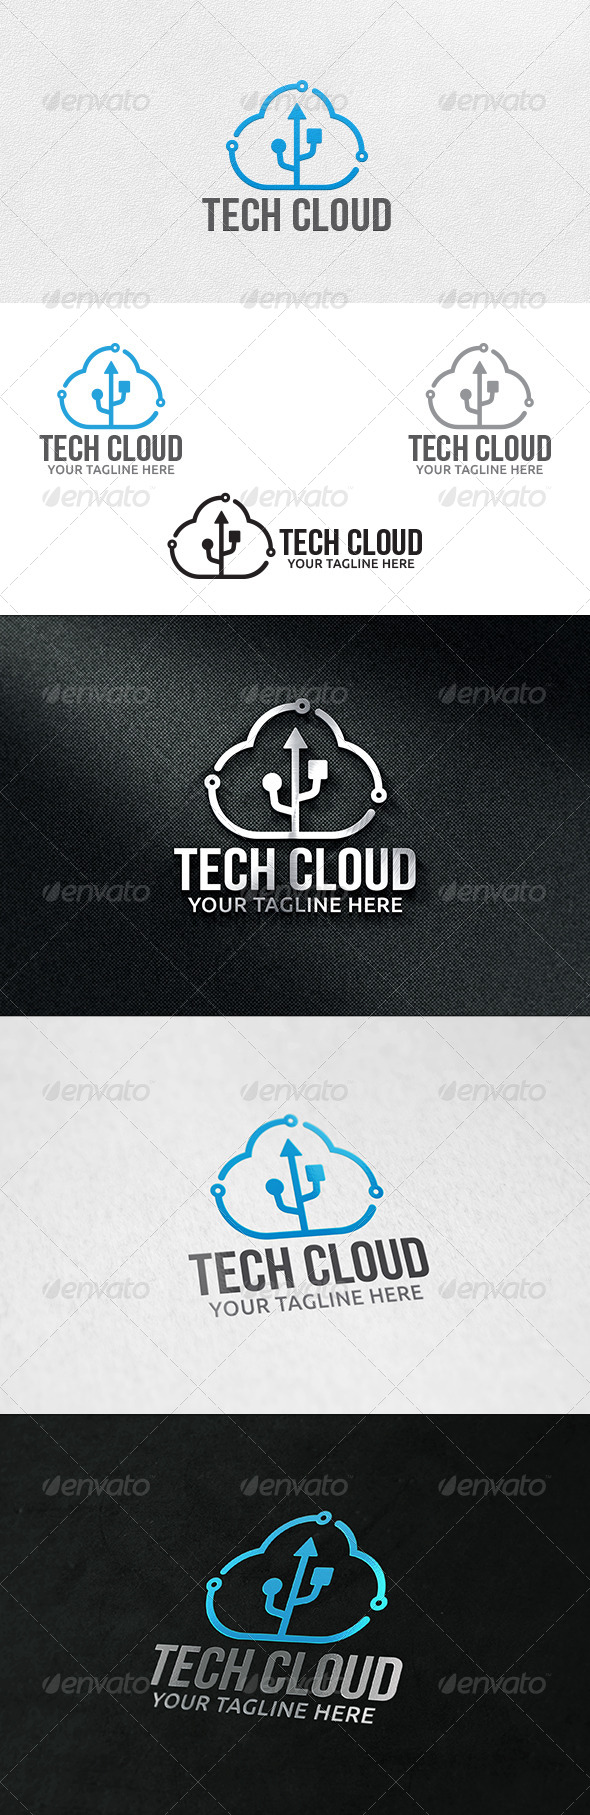 Cloud Tech - Logo Template - Symbols Logo Templates